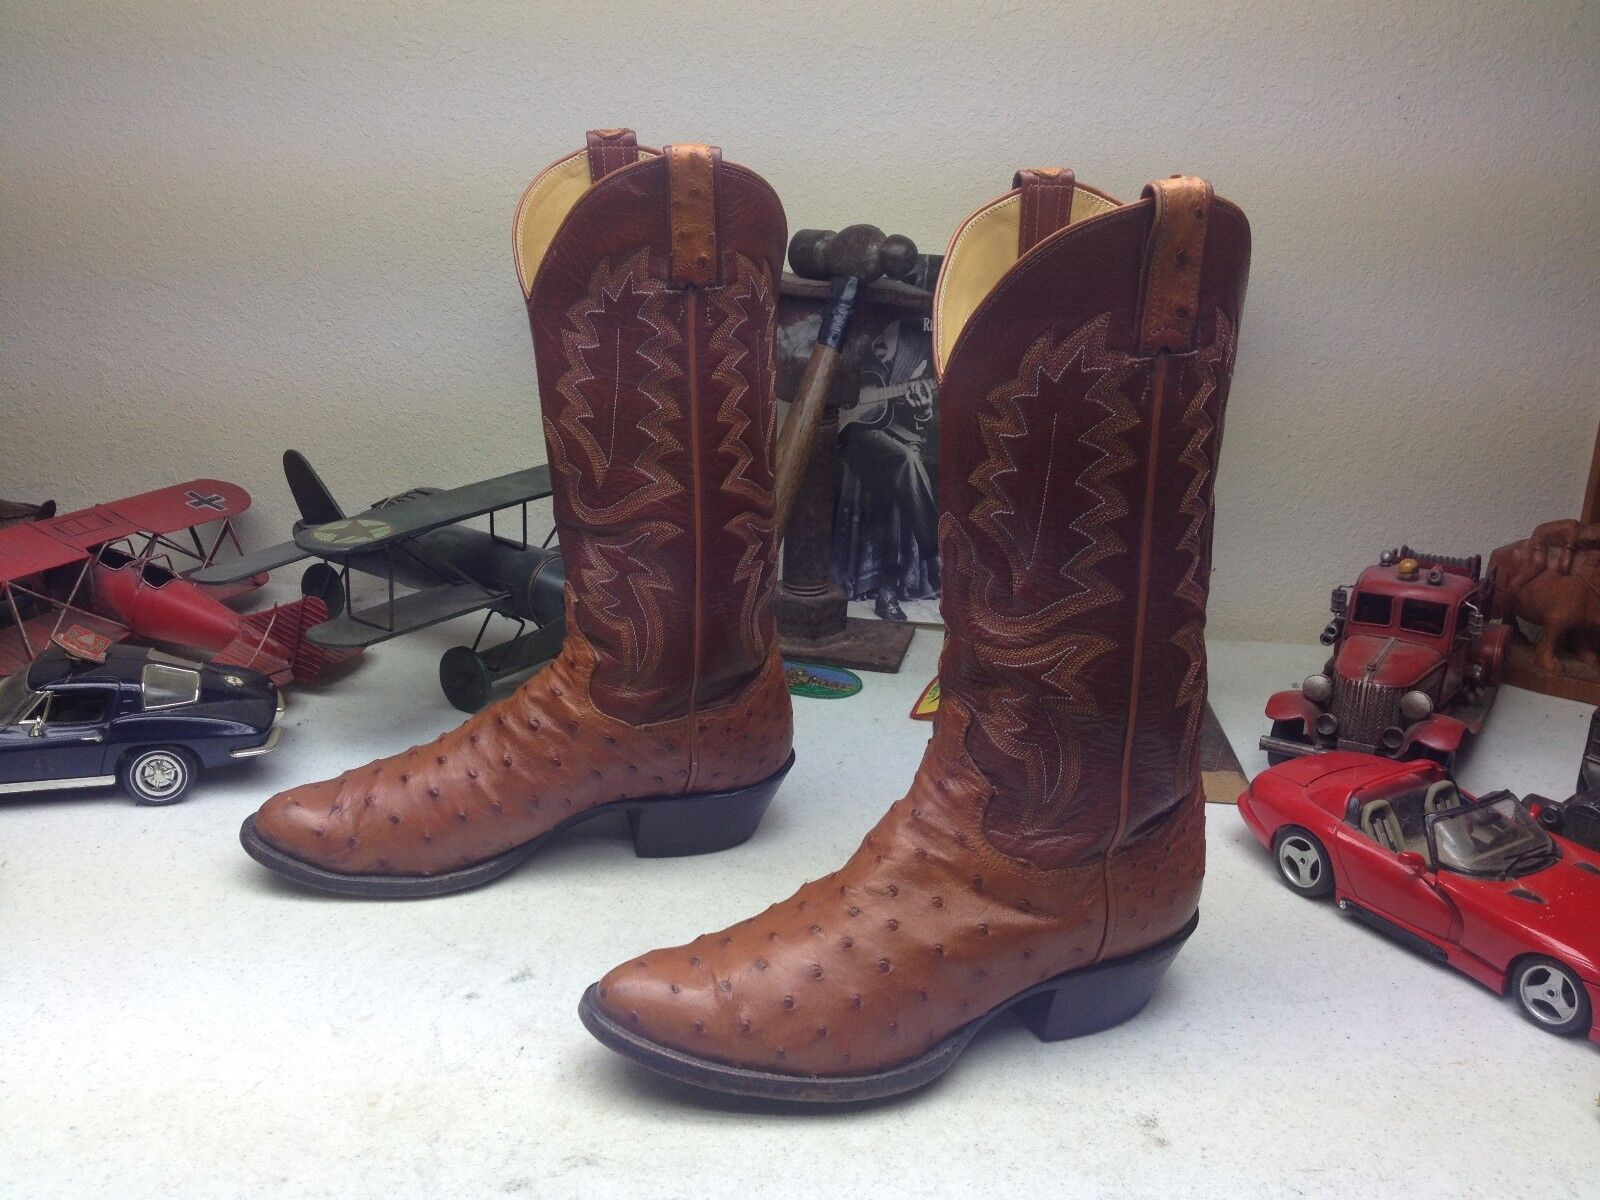 PANHANDLE SLIM Coñac ingeniero de cuero de avestruz Western Trail Boss botas 8 D